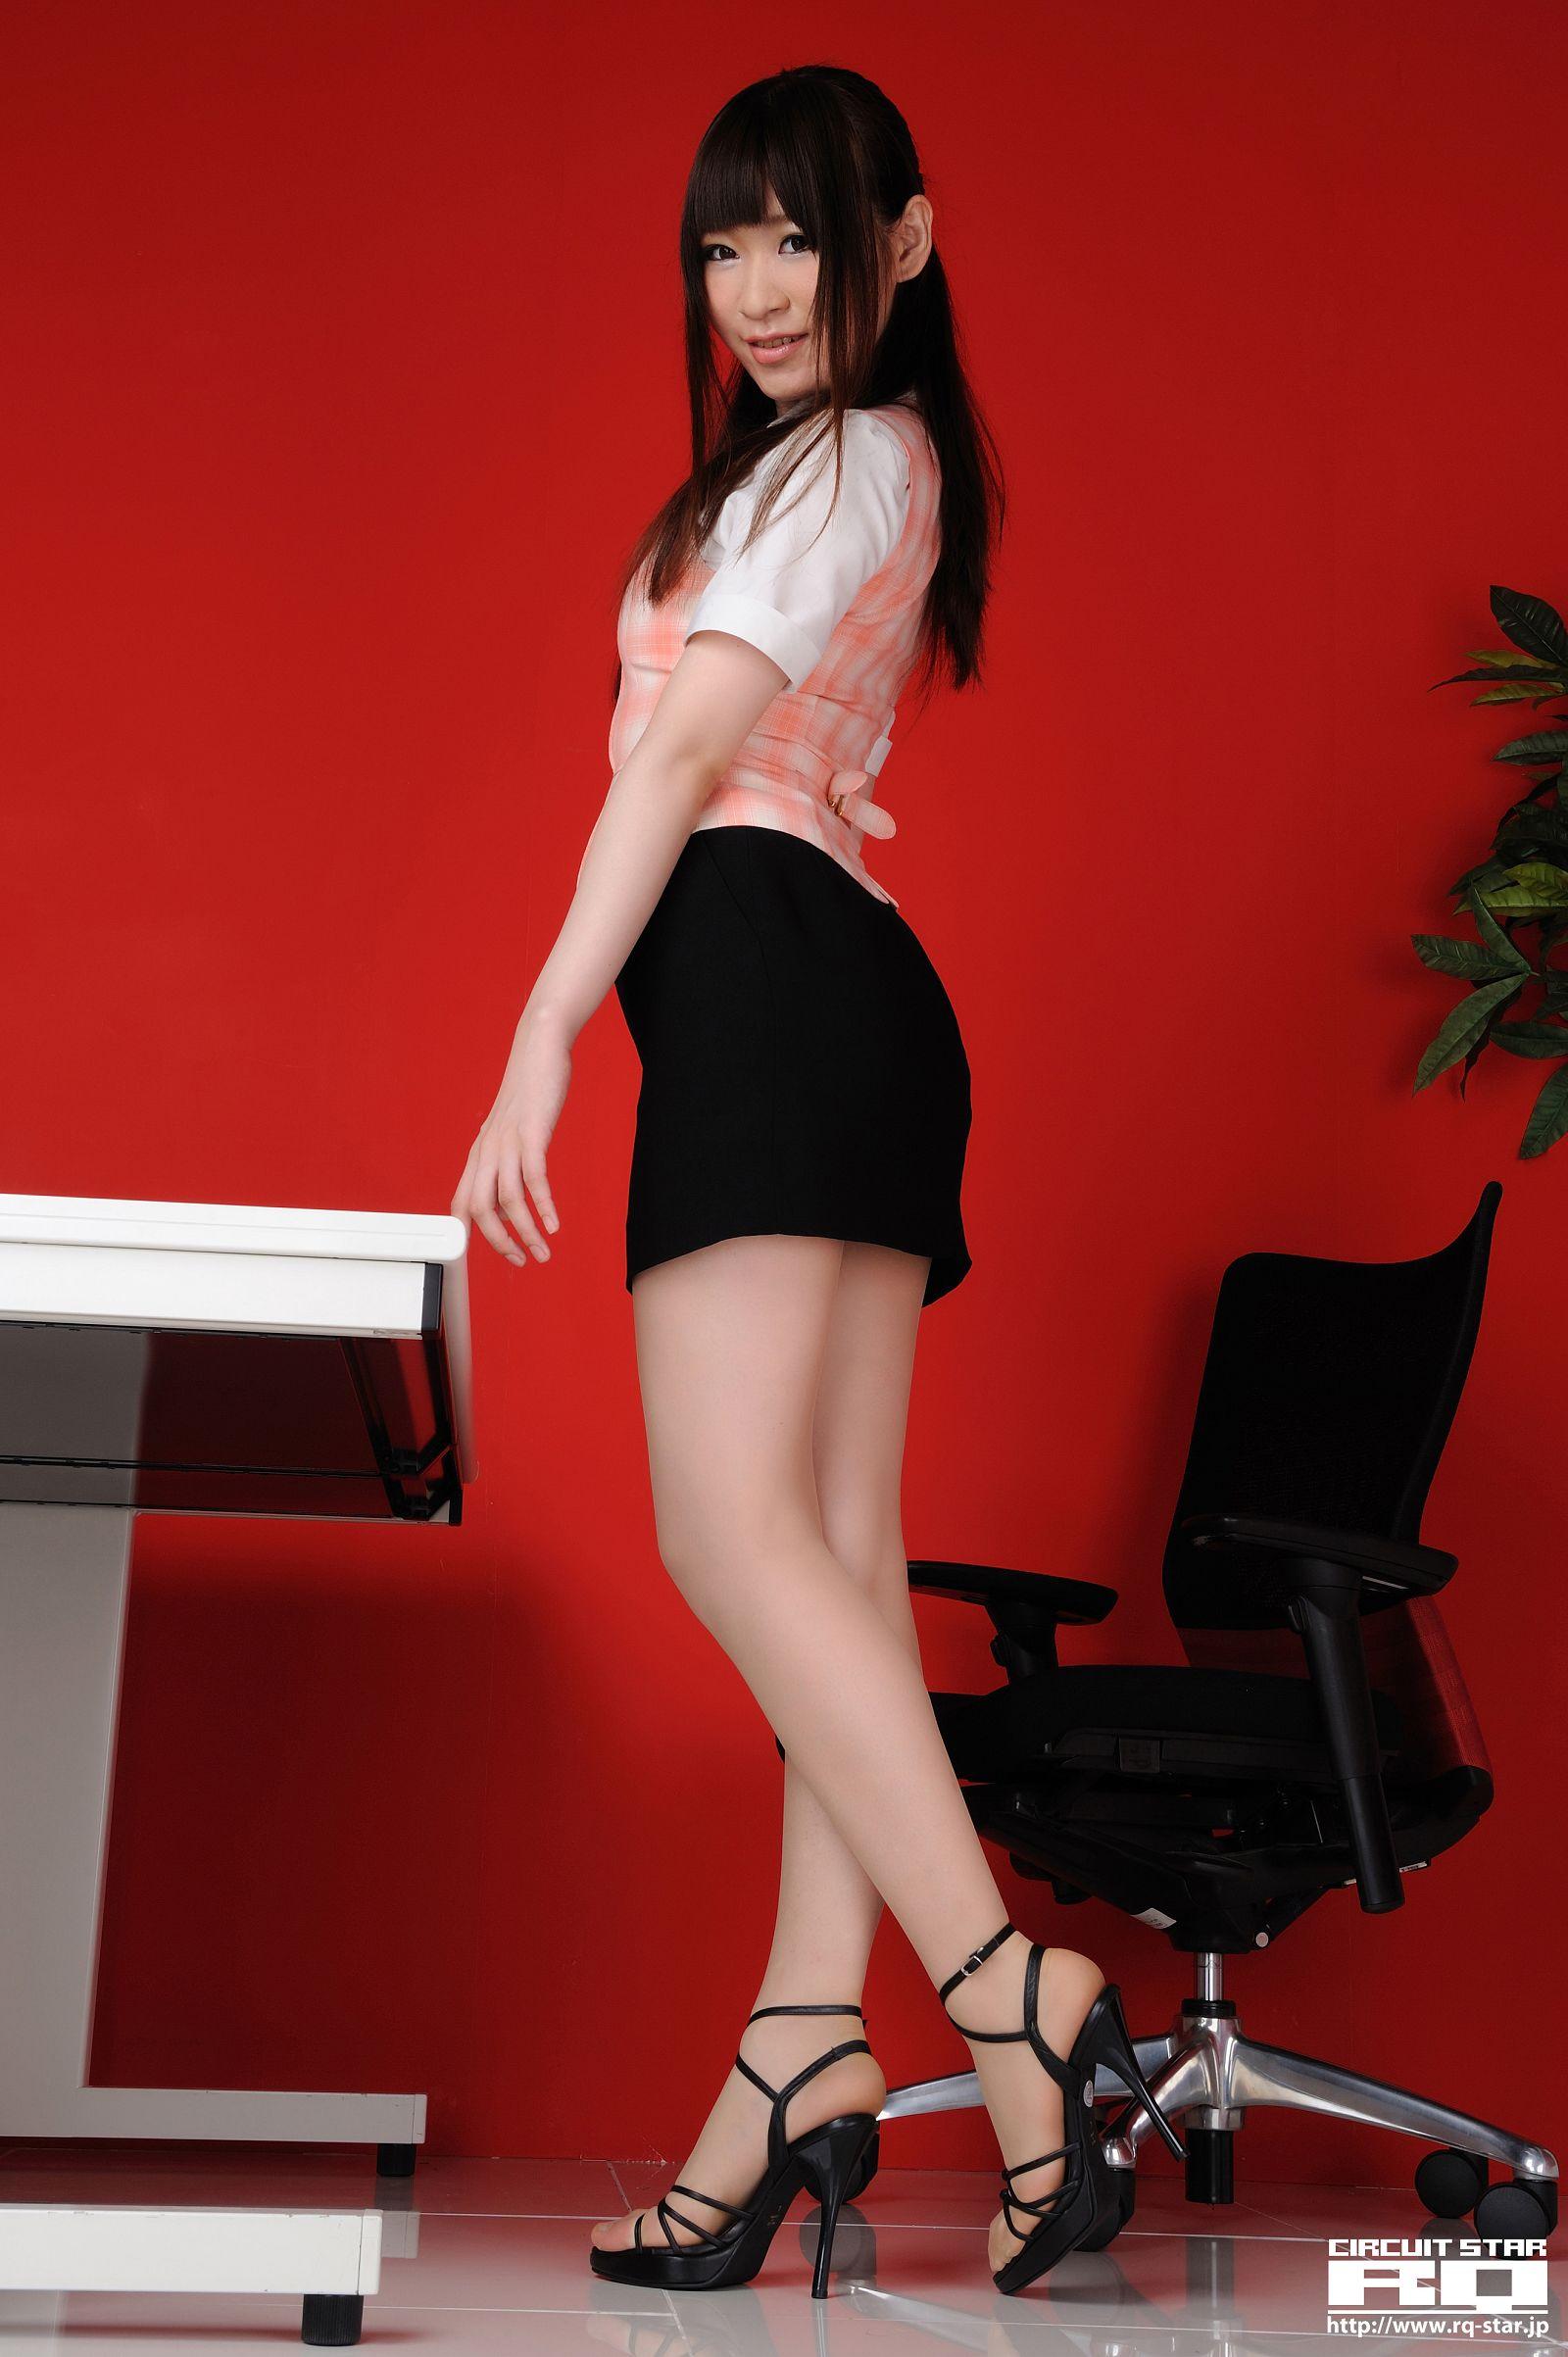 [RQ STAR美女] NO.00566 Eri Tomoki 友木えり Office Lady[77P] RQ STAR 第2张